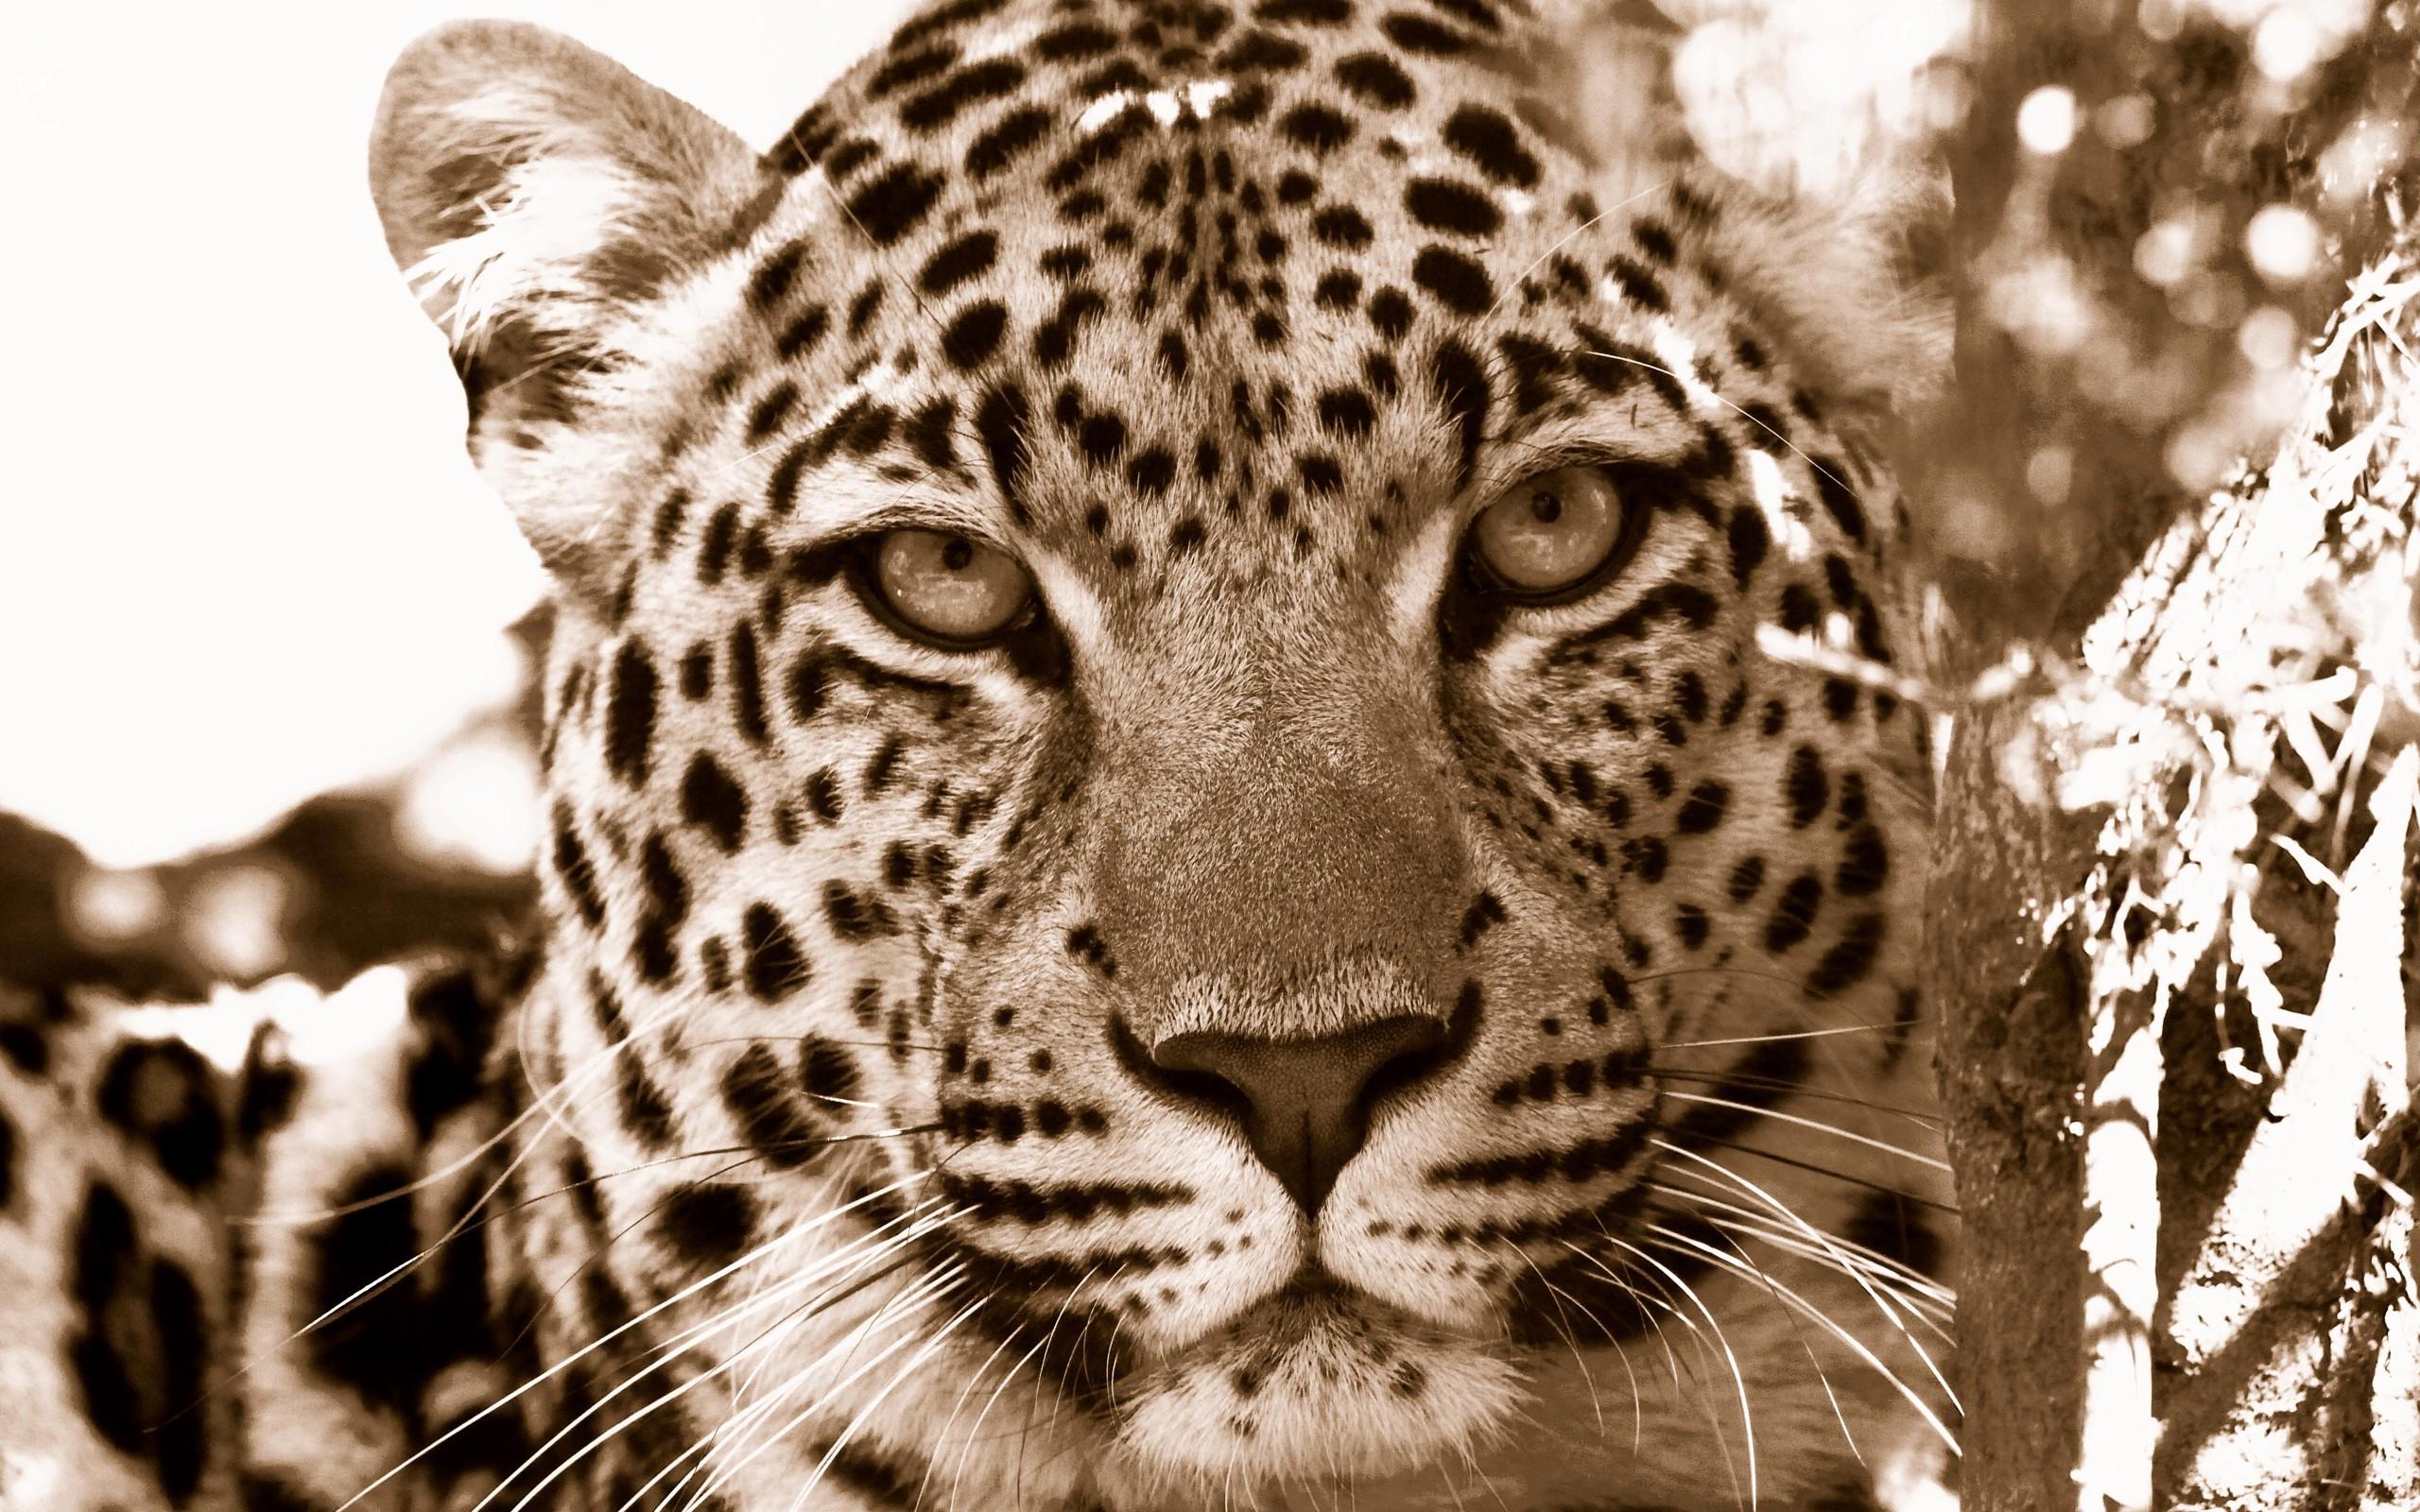 Animals monochrome nature wildlife big cats whiskers leopard jaguar cheetah jaguars snow leopard fauna mammal 2560x1600